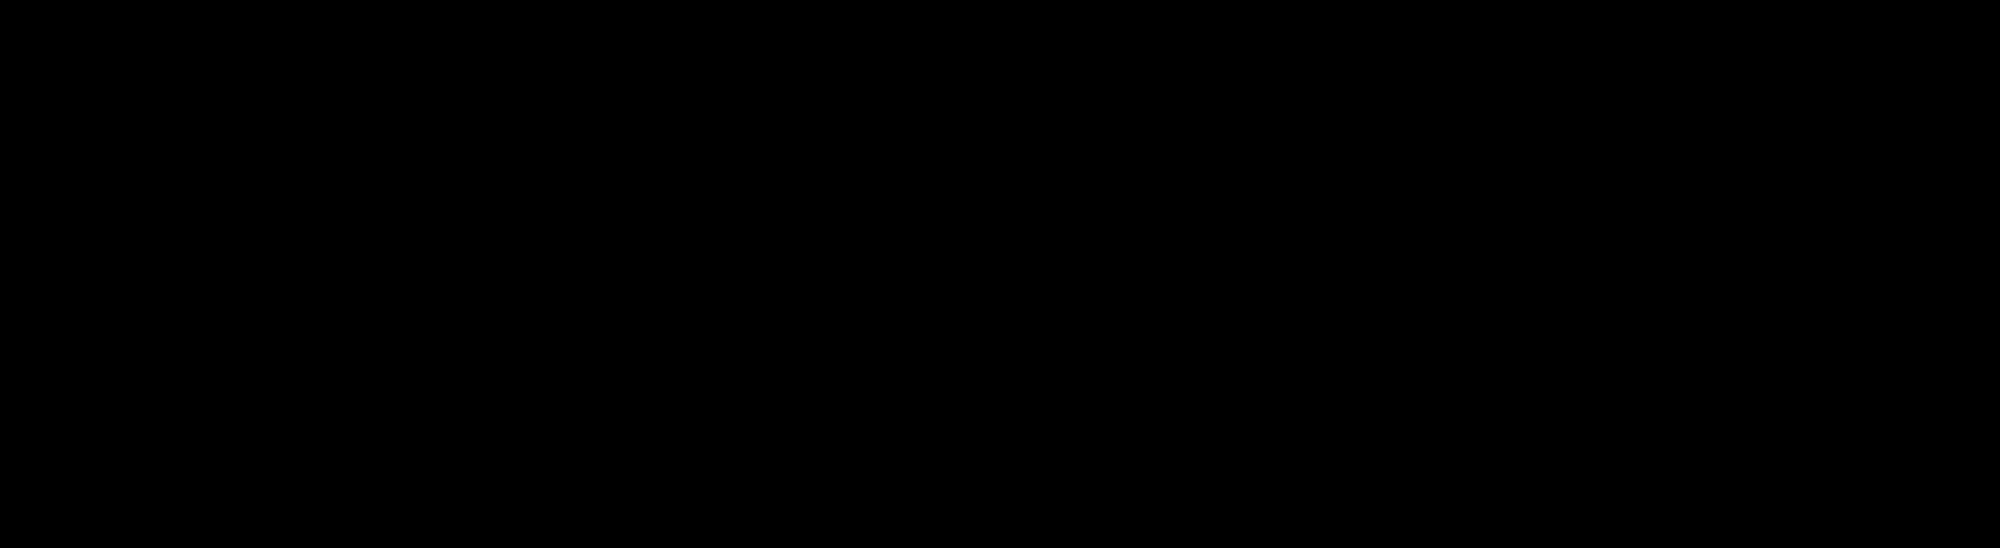 GO-035-d<sub>12</sub>